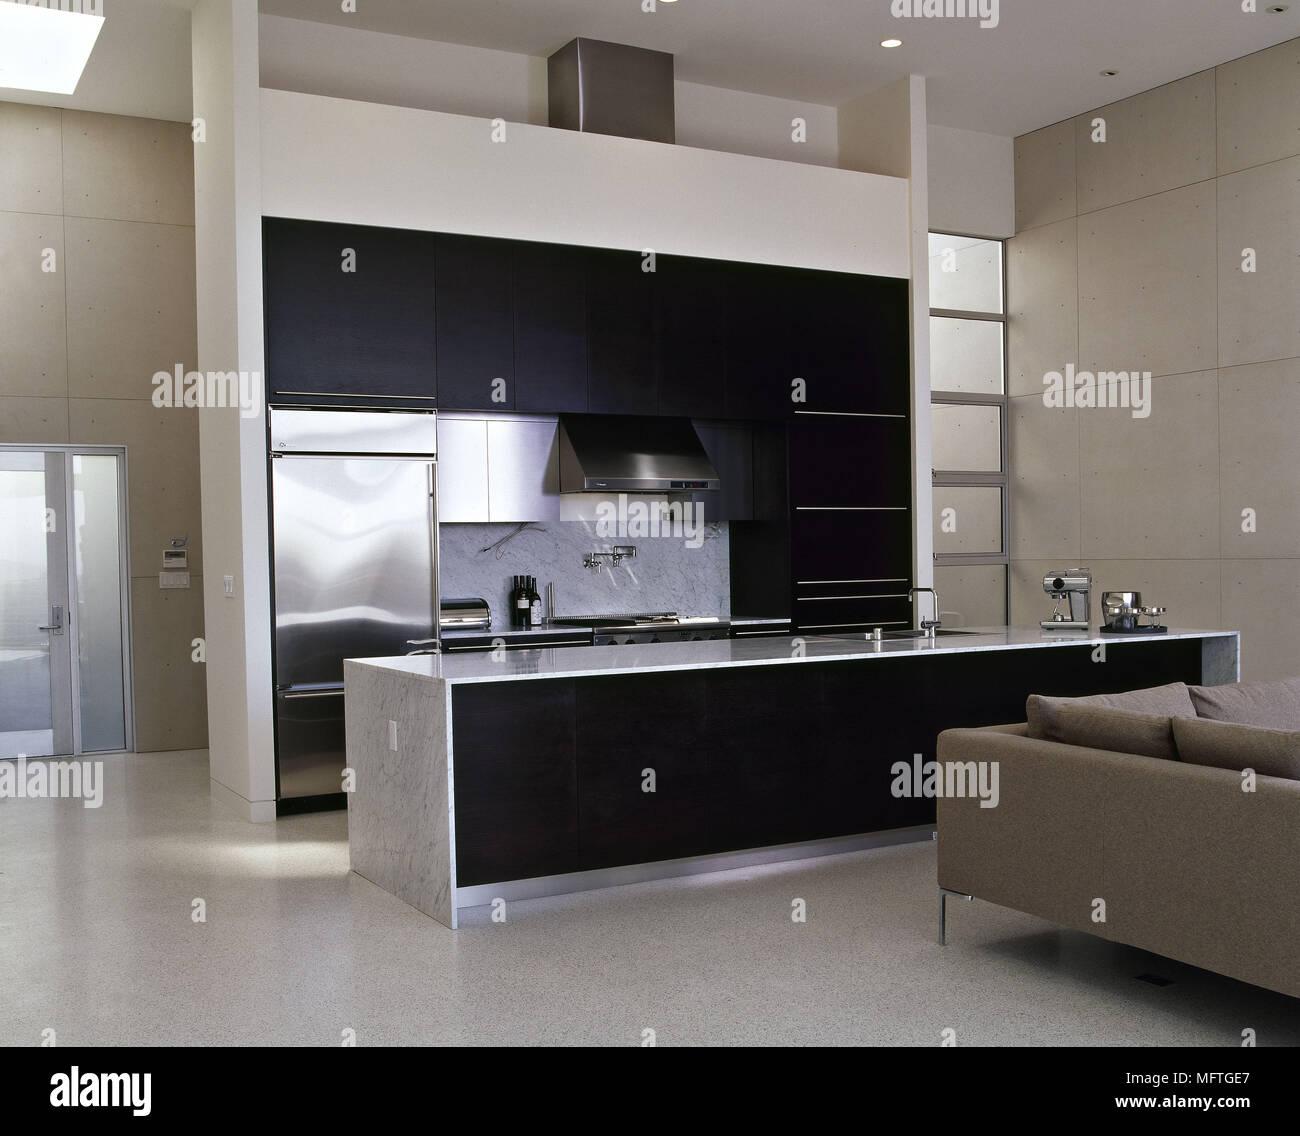 Plan ouvert ultra moderne avec coin salon cuisine monochrome ...